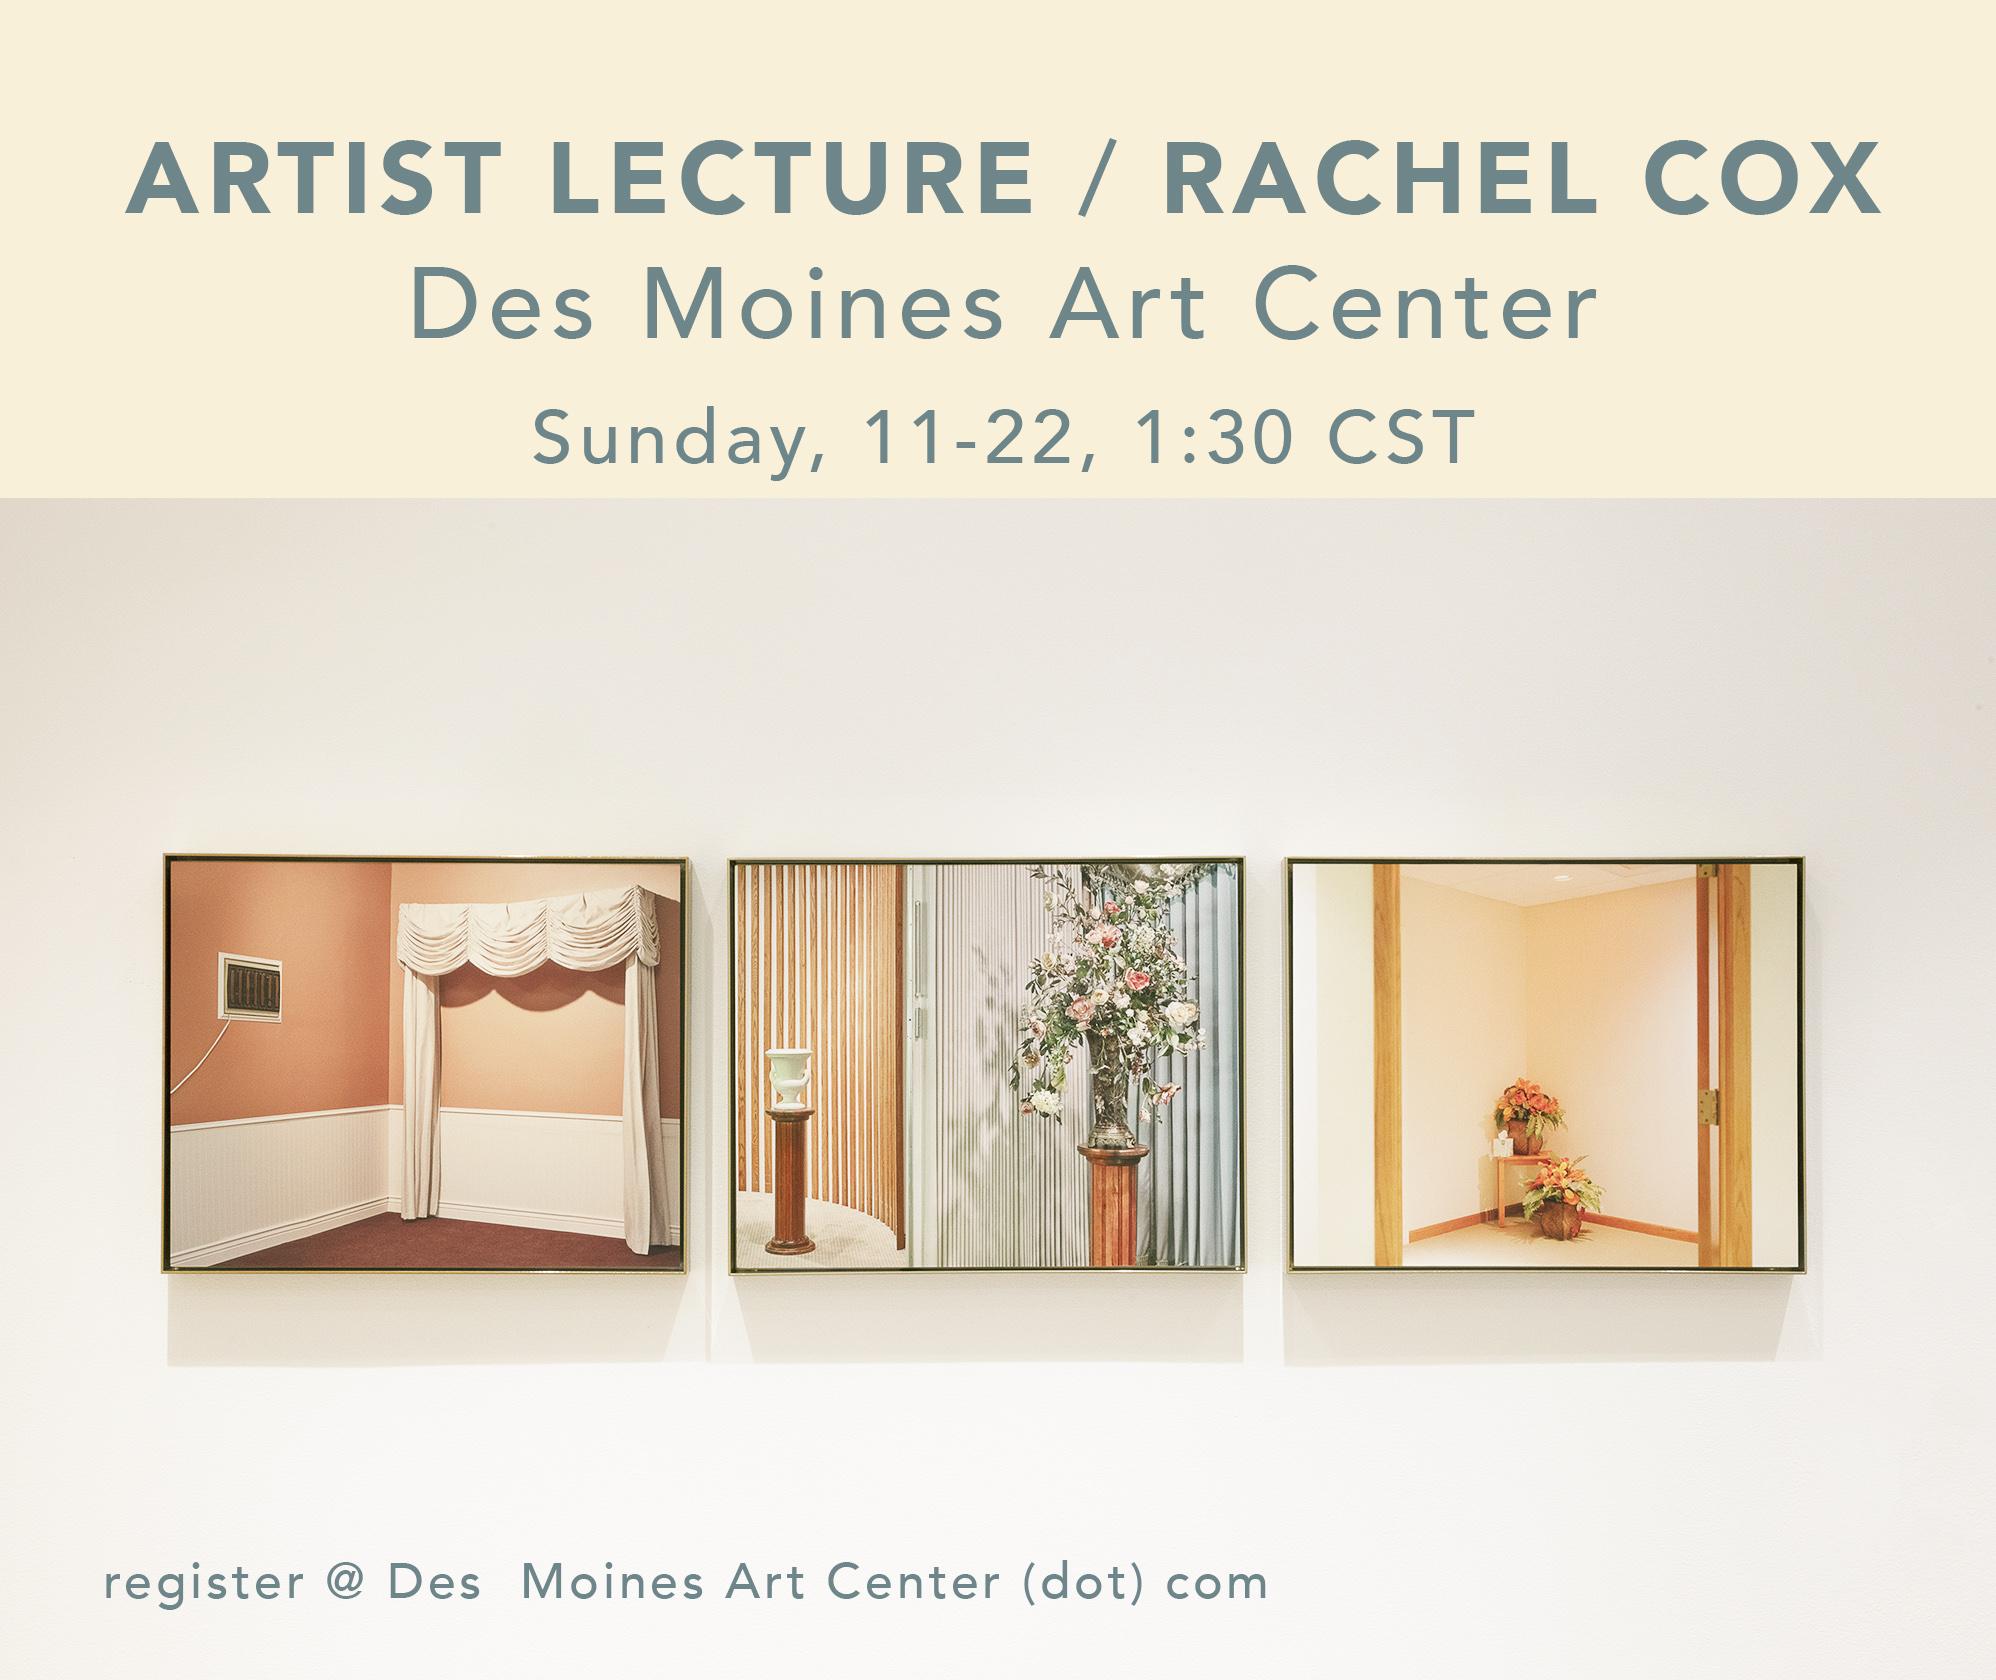 Artist Lecture / Rachel Cox